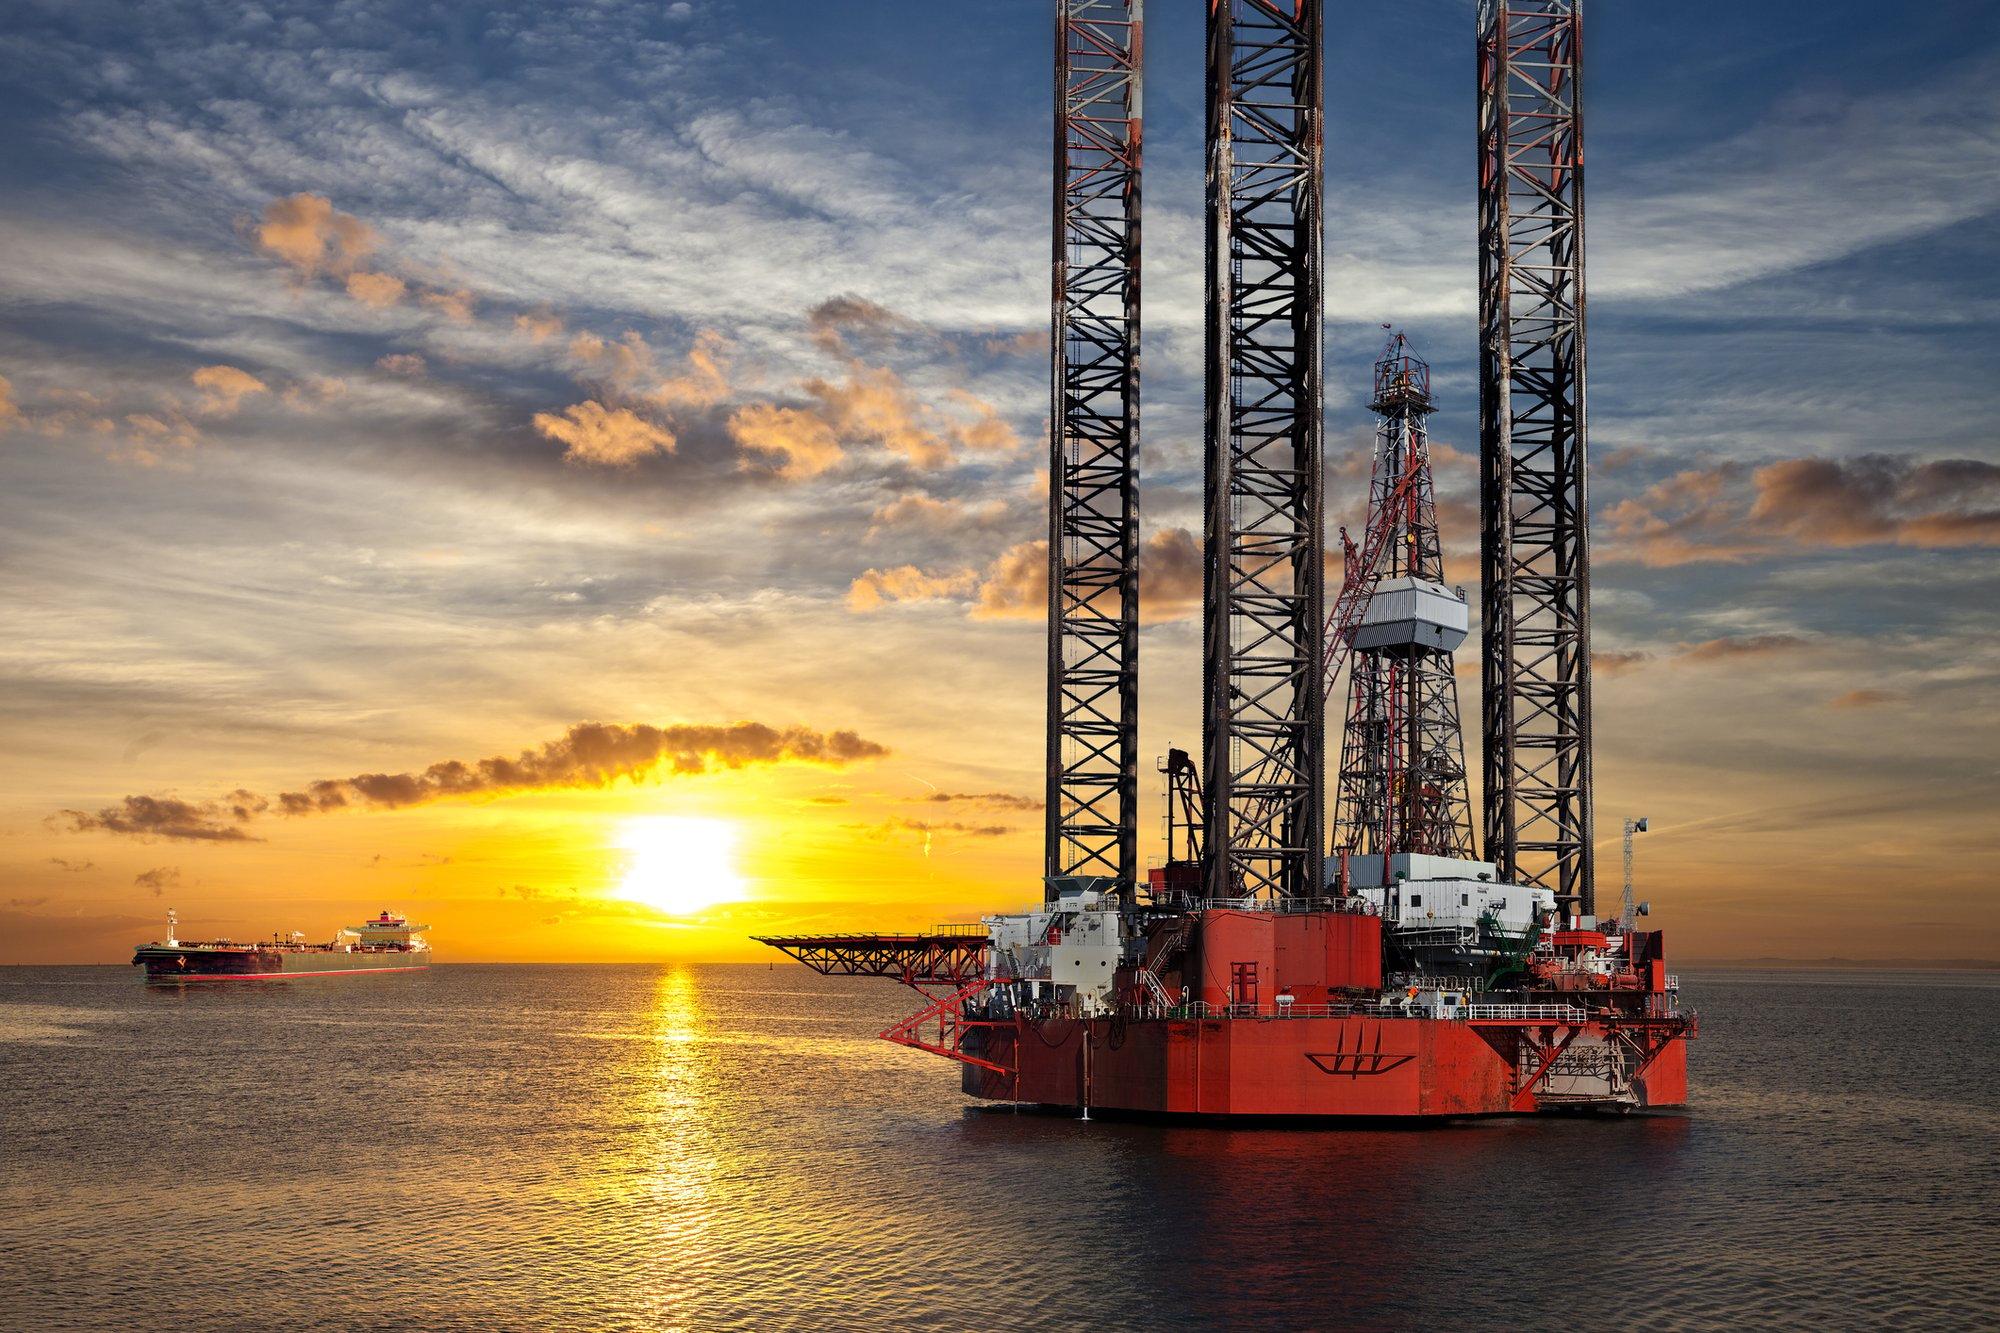 Oceaneering International (OII) Stock Jumps Again On Analyst Upgrade